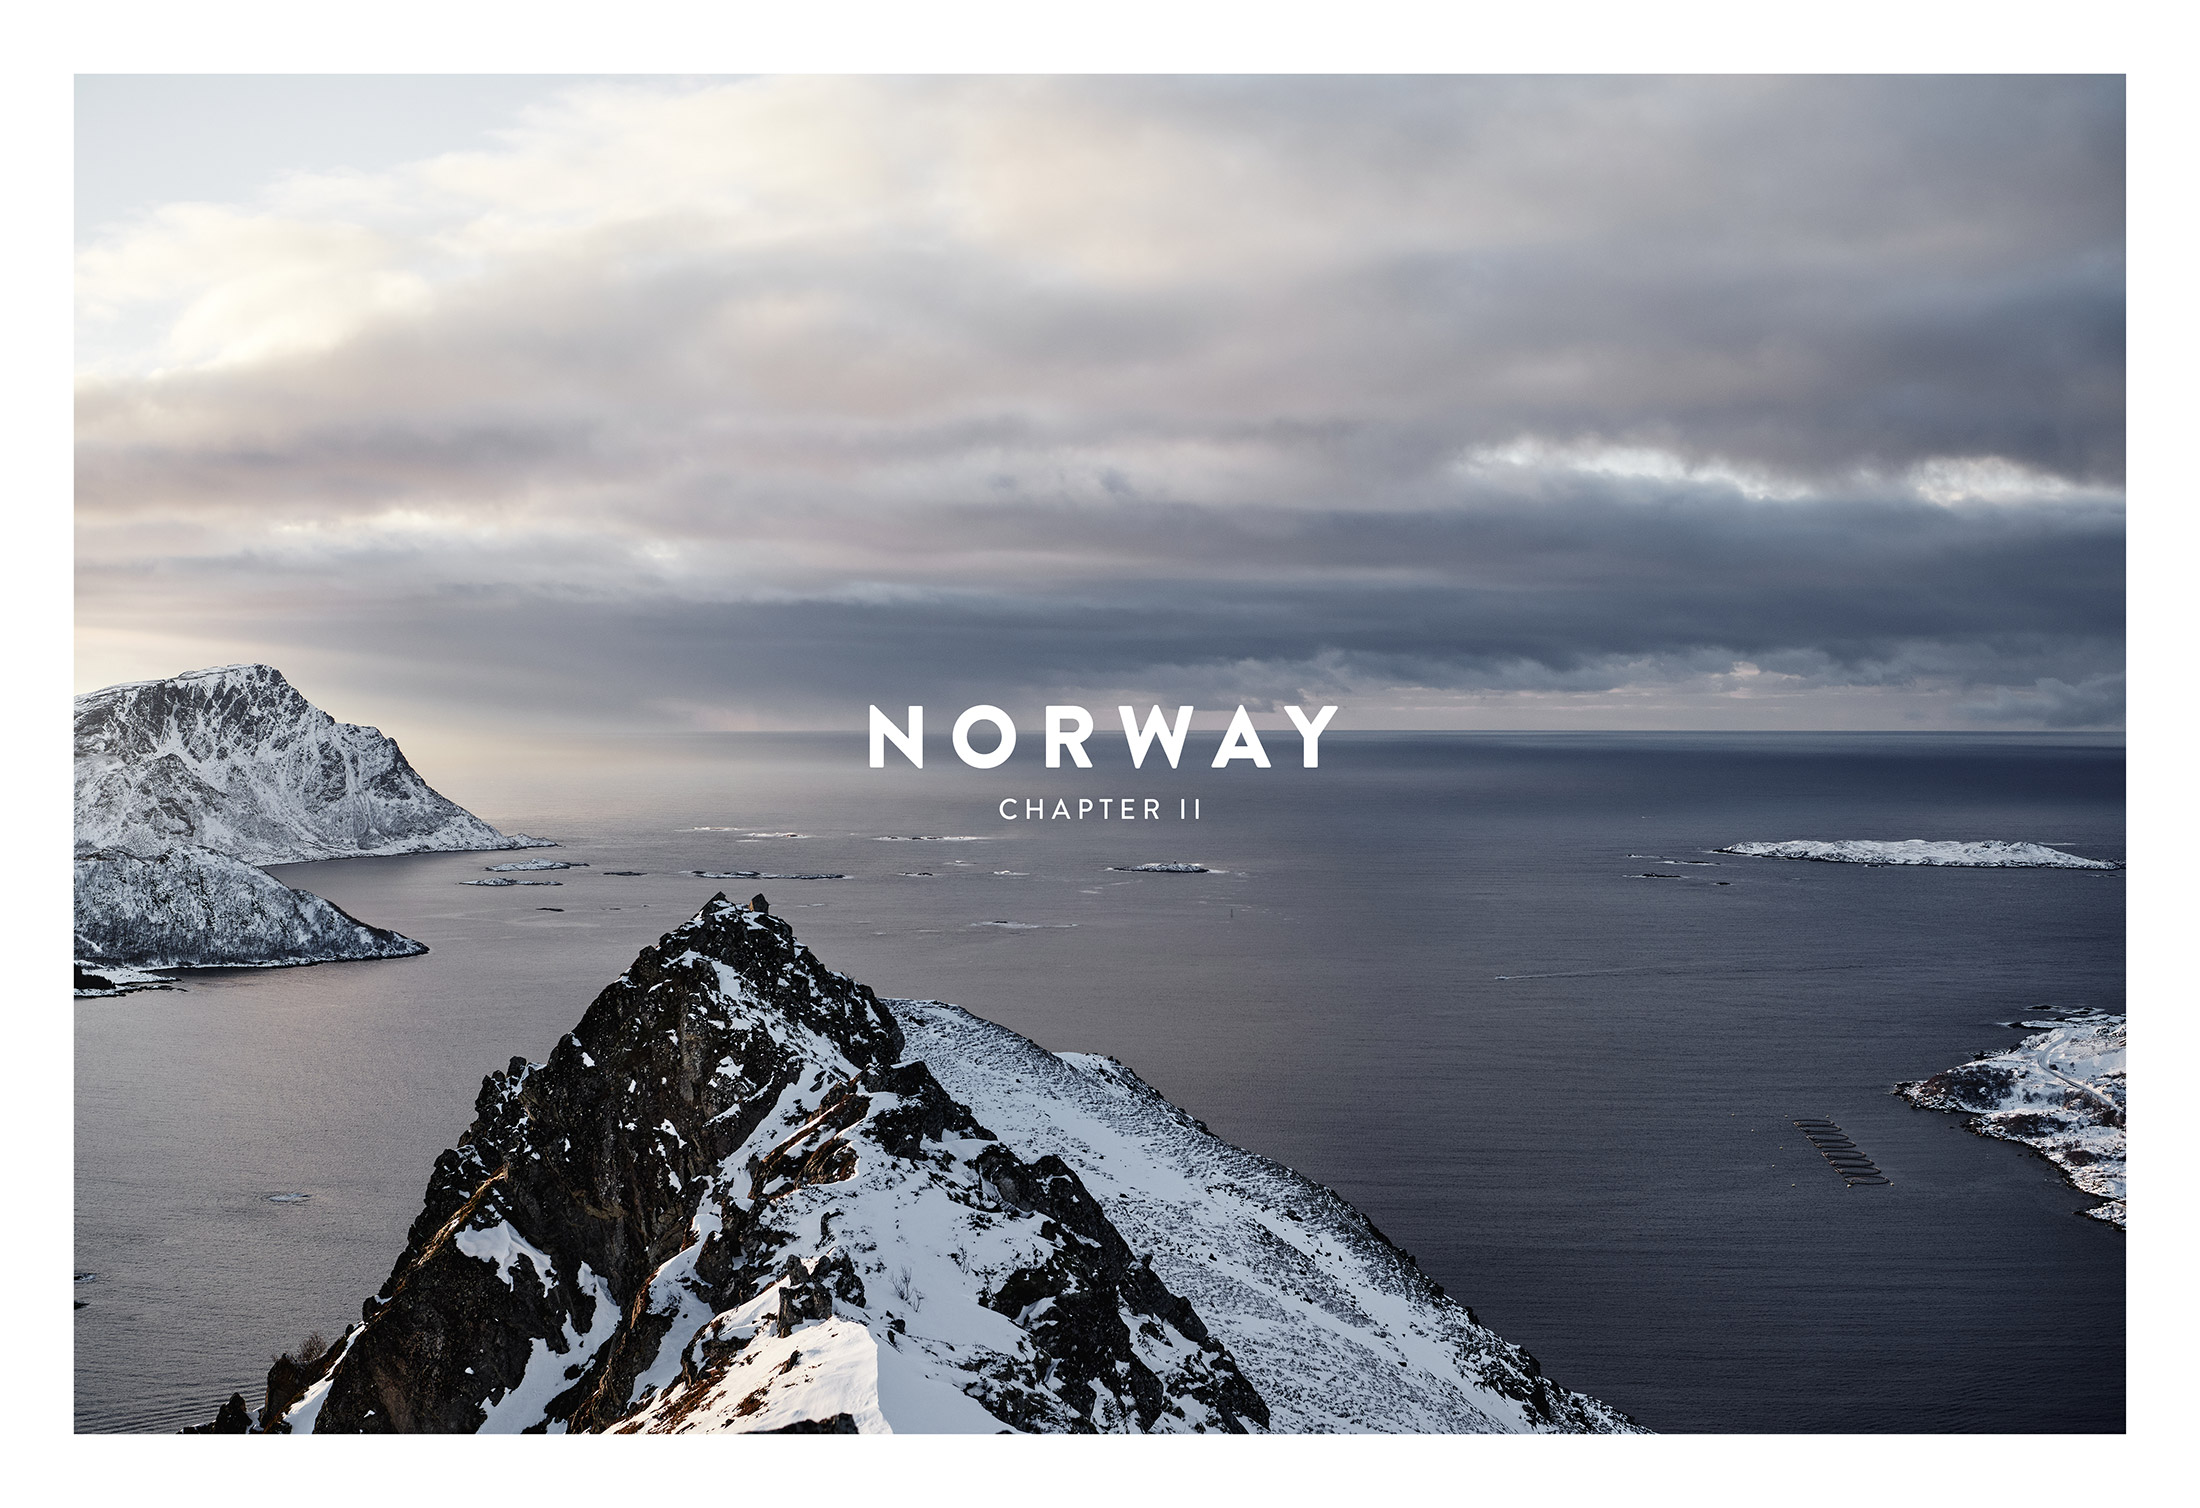 norway_II_koenigshofer.jpg